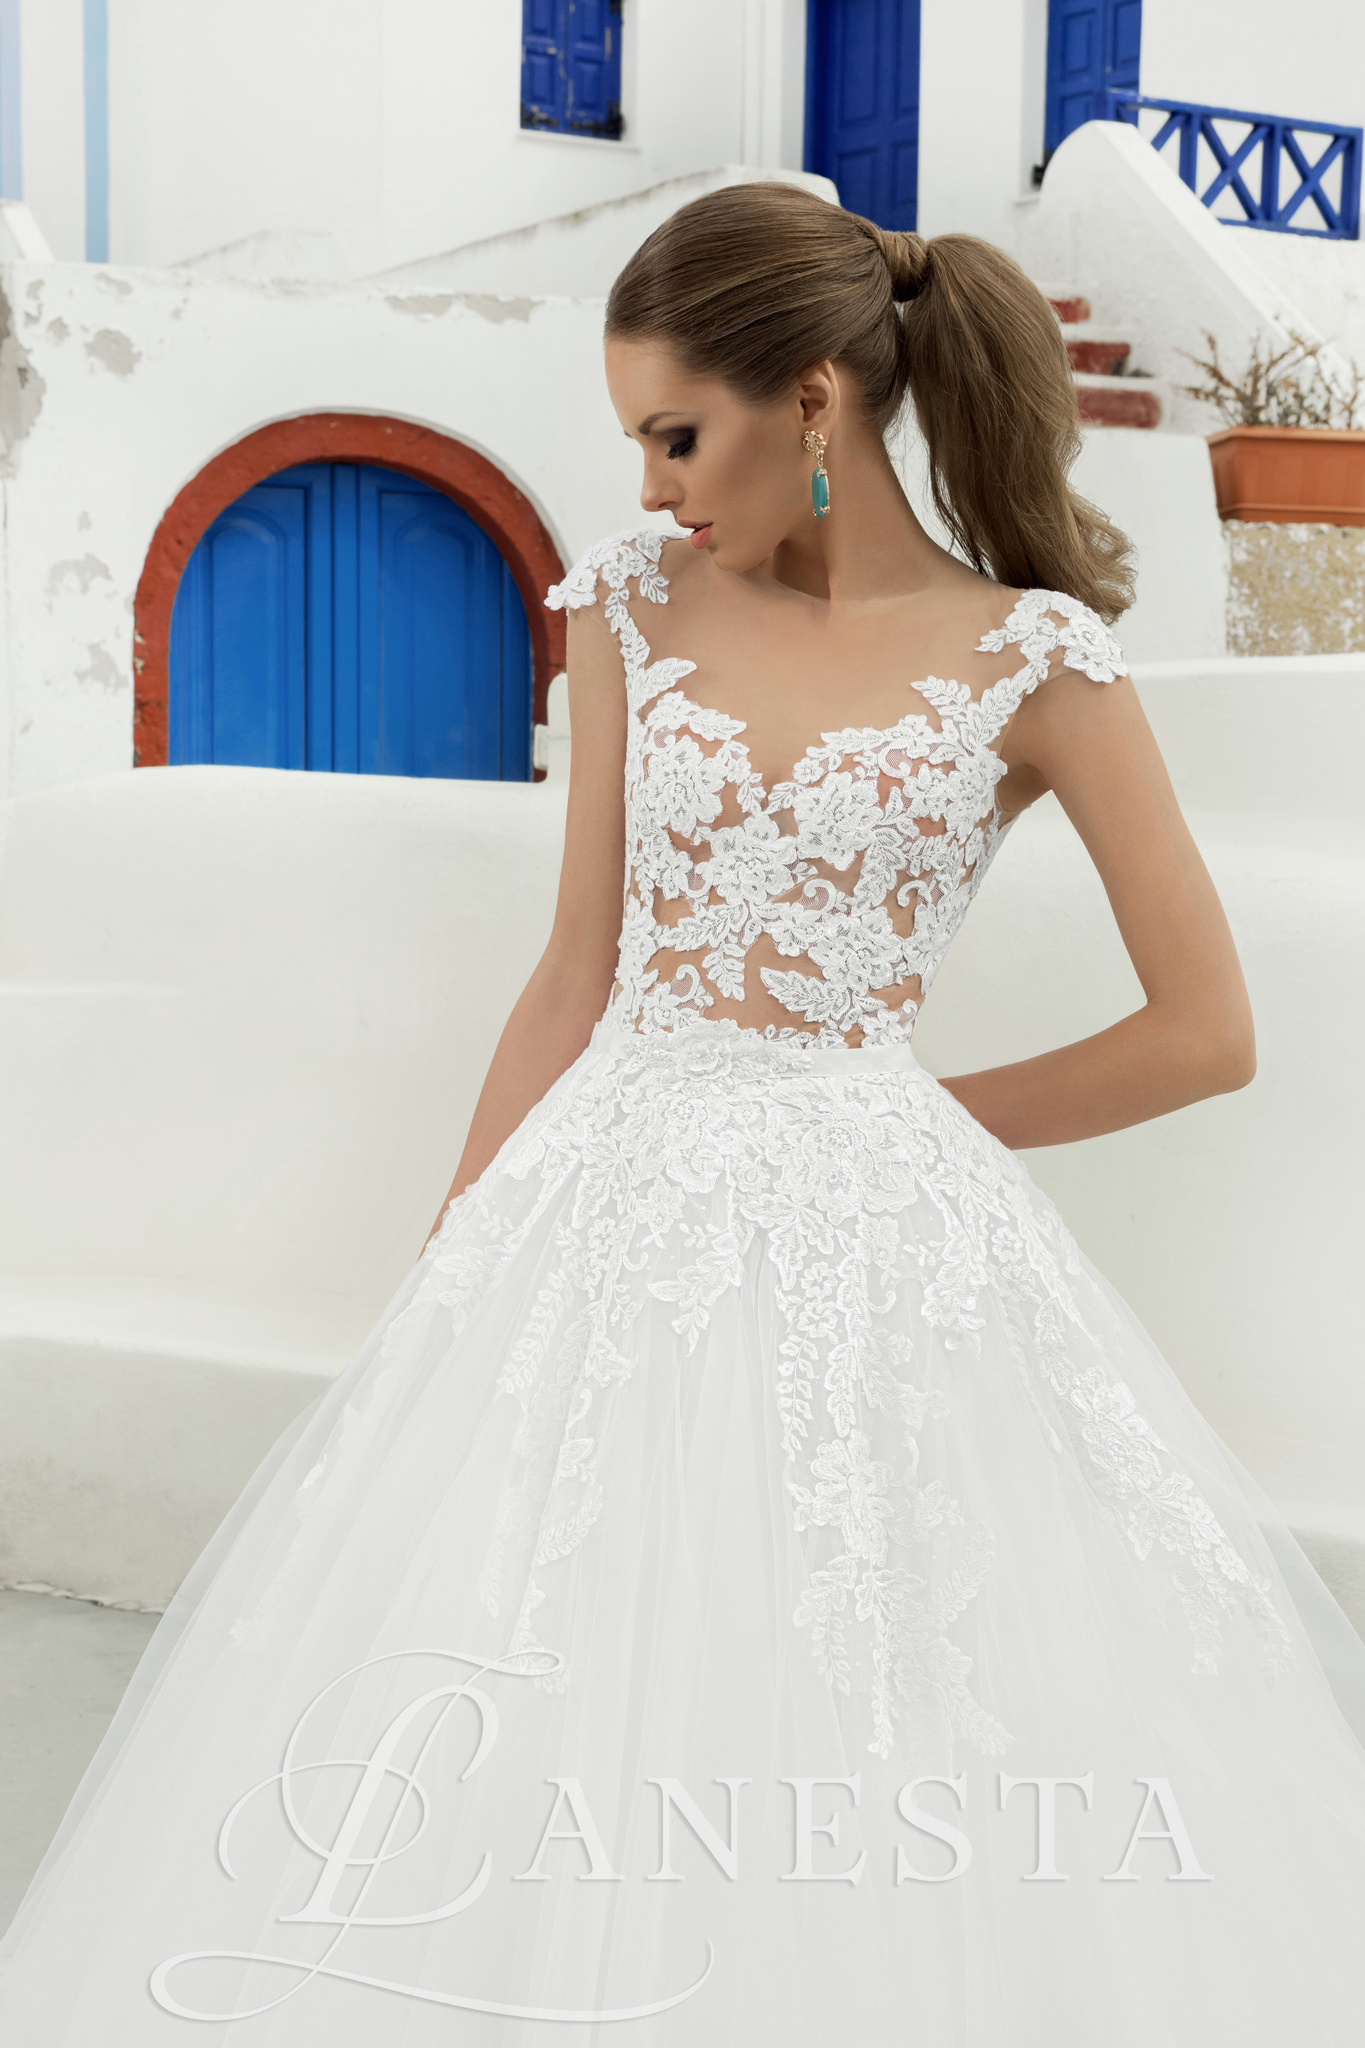 suknia ślubna kolekcji Lanesta - Bjanka